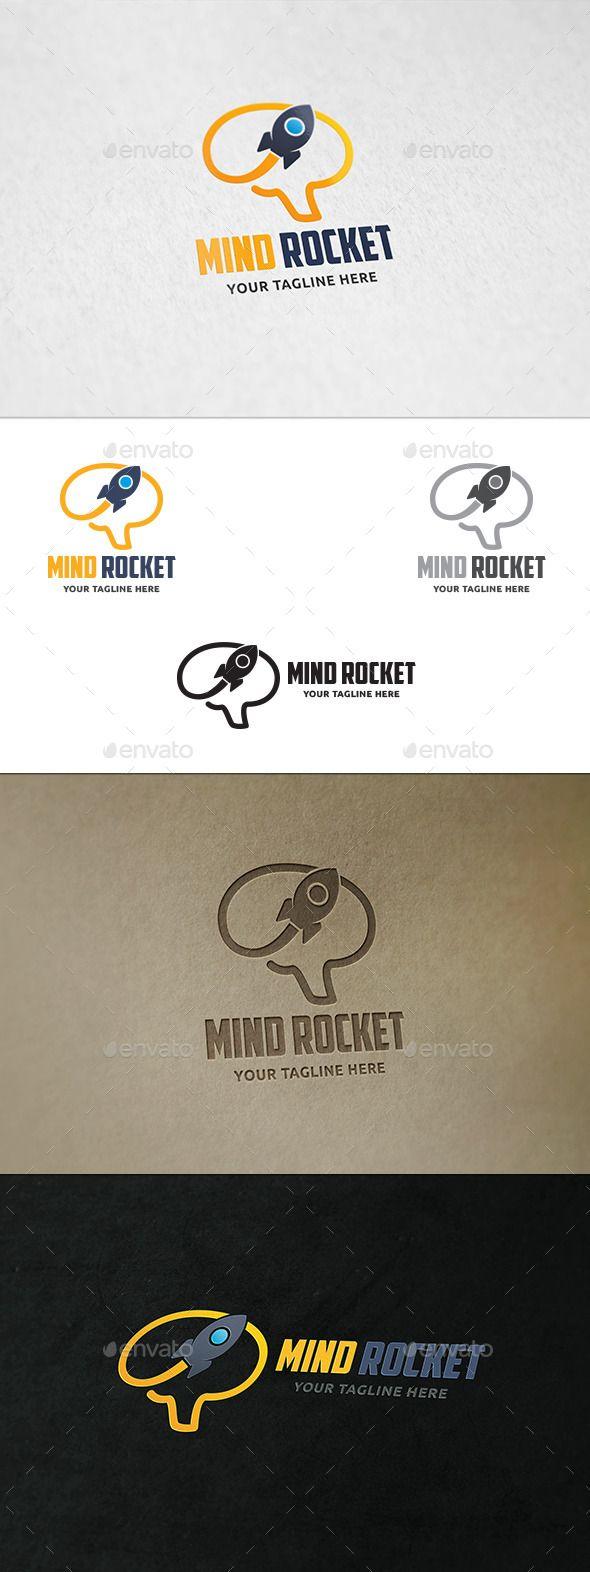 Mind Rocket - Logo Template Vector EPS, AI. Download here: http://graphicriver.net/item/mind-rocket-logo-template/11776088?ref=ksioks